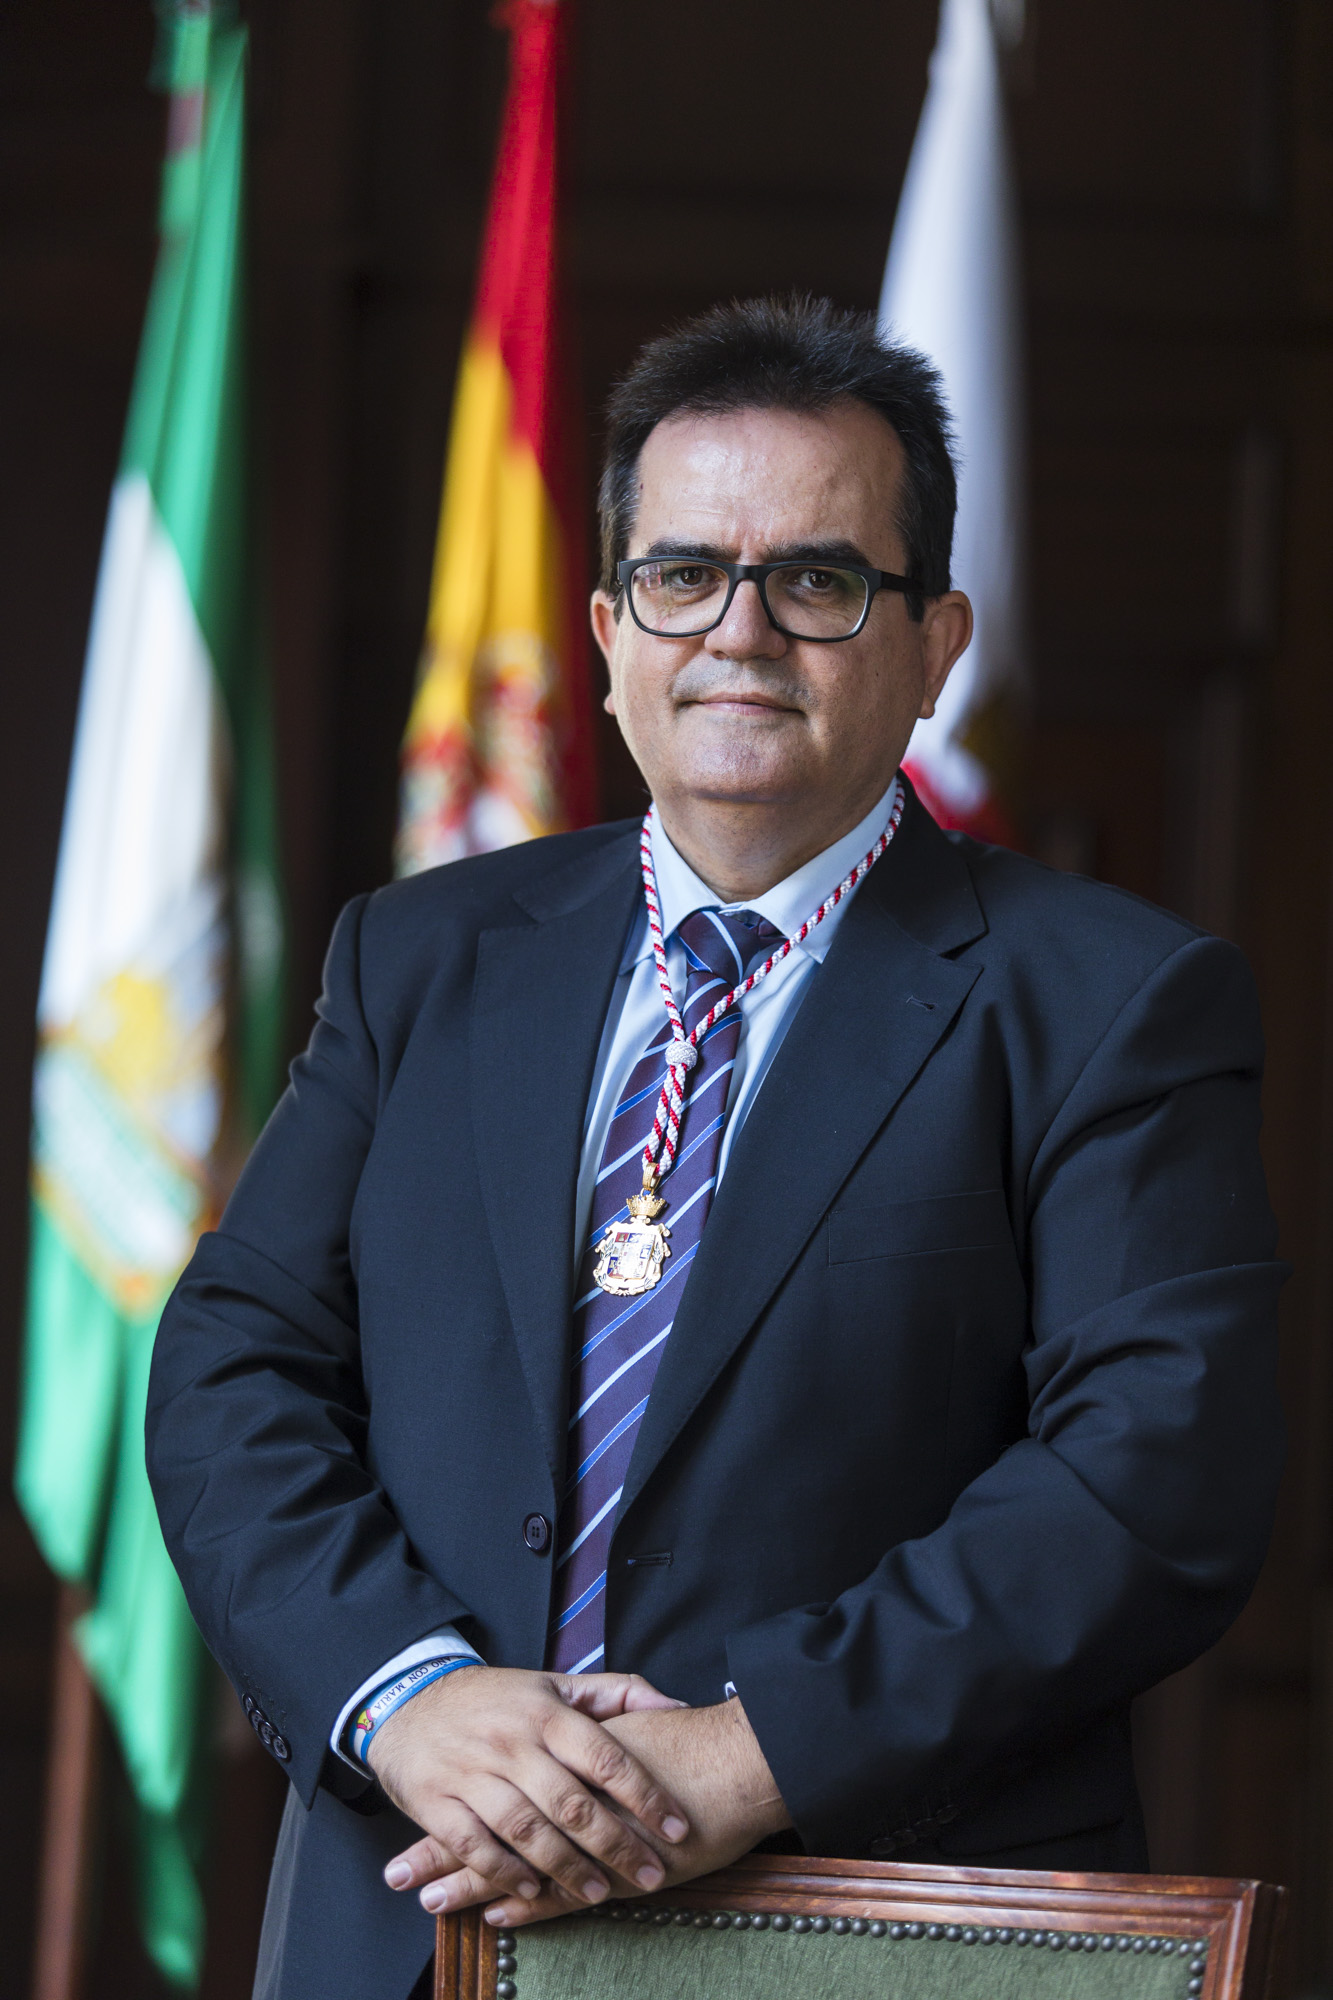 Antonio Jesús Rodríguez Segura